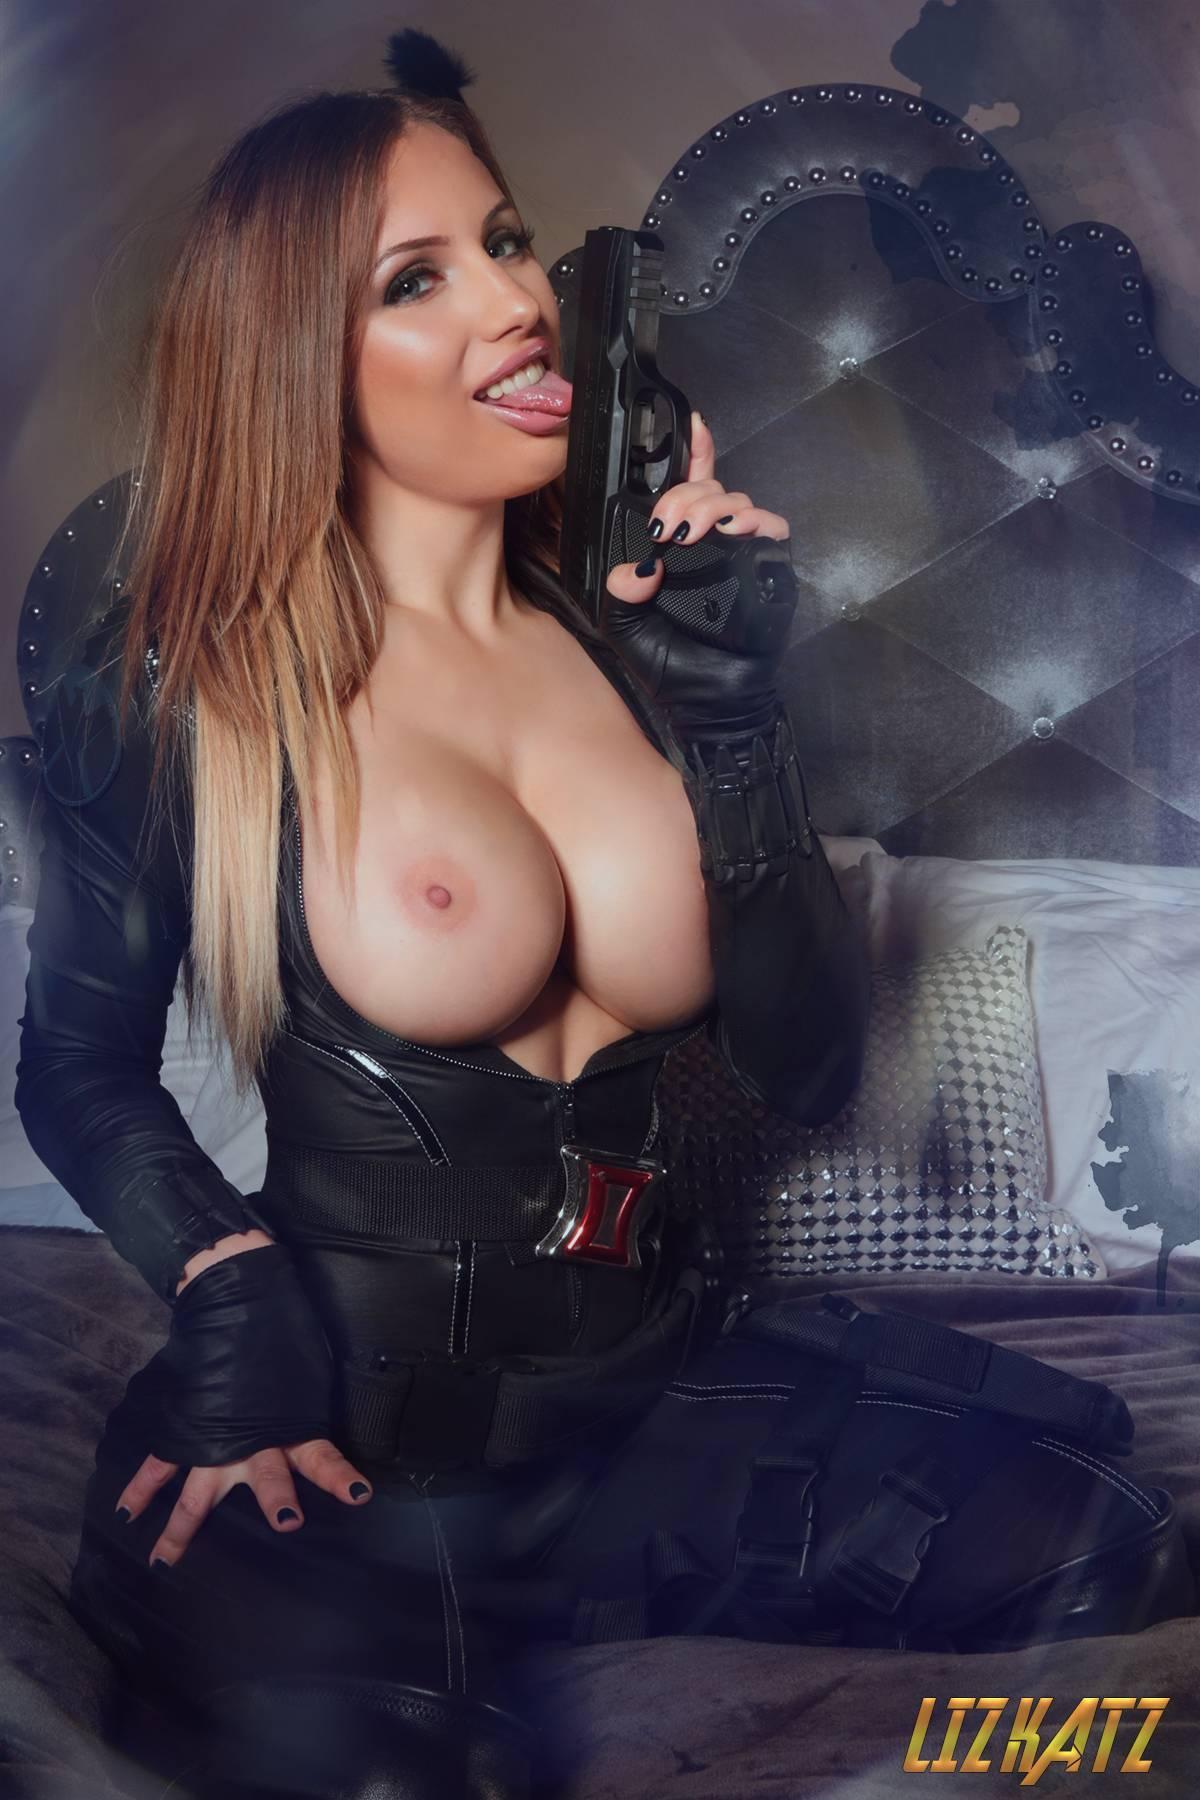 Liz Katz Topless Black Widow Cosplay Onlyfans Set Leaked Hahutv